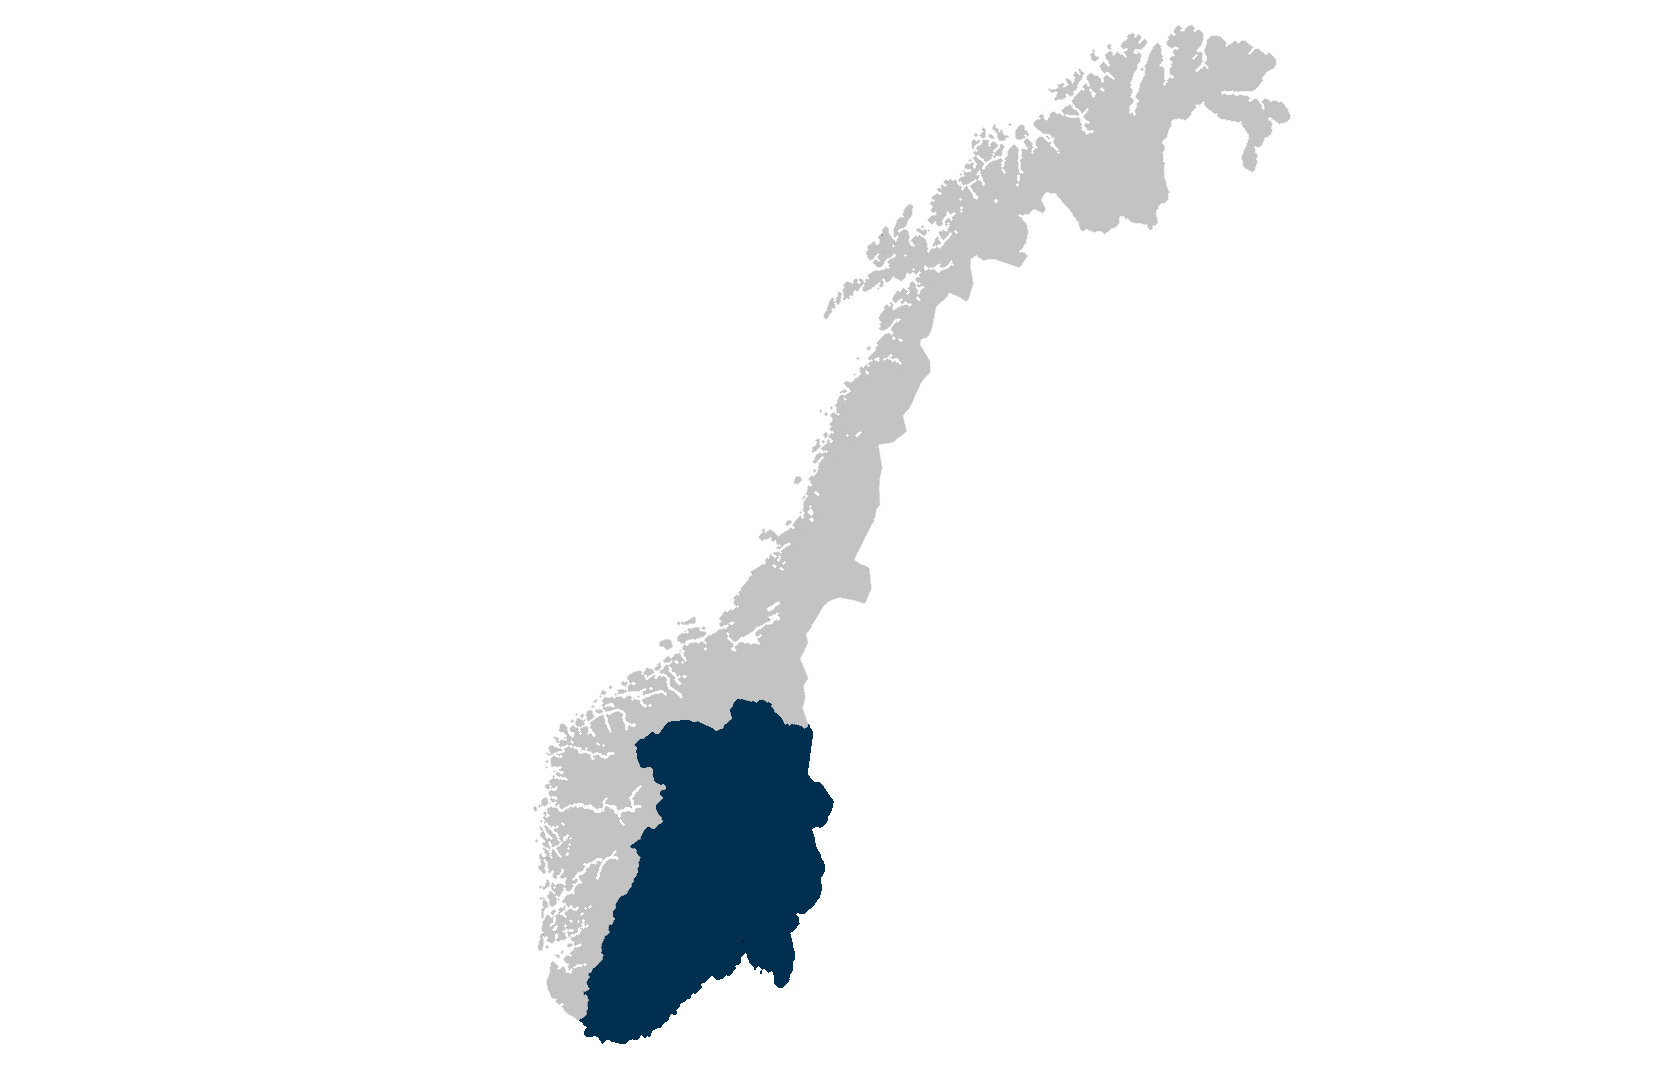 Sørøst pano